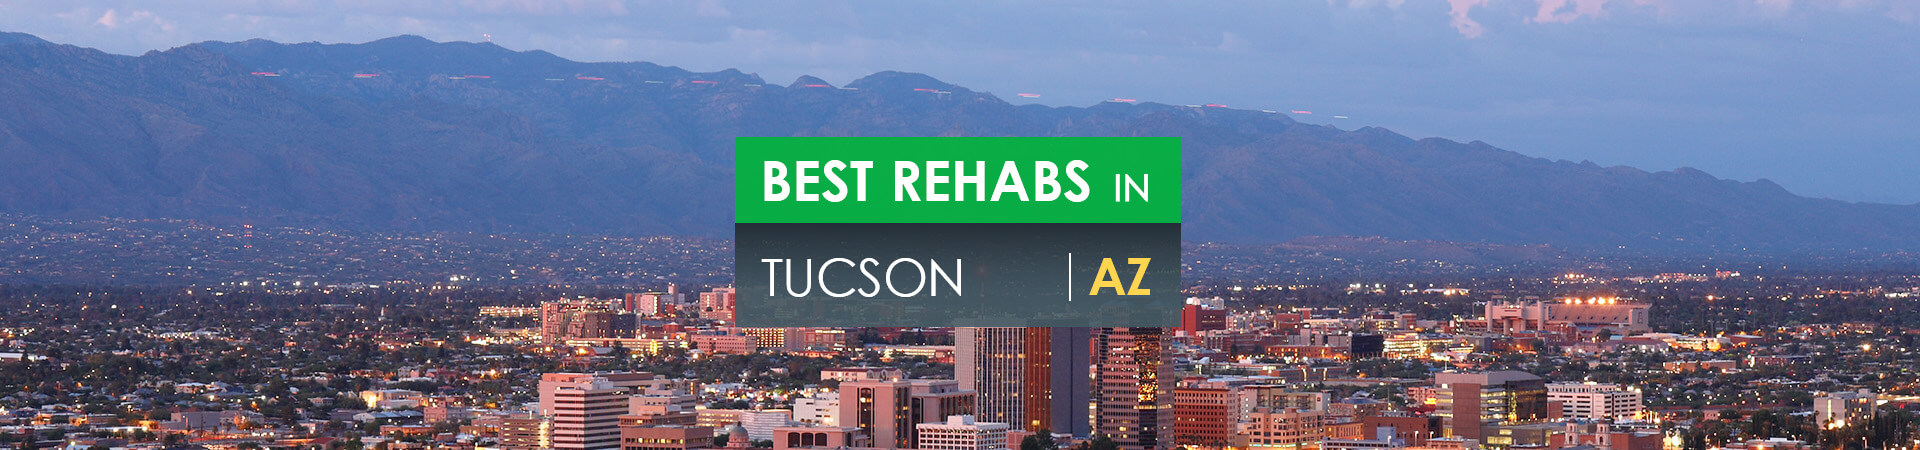 Best rehabs in Tucson, AZ